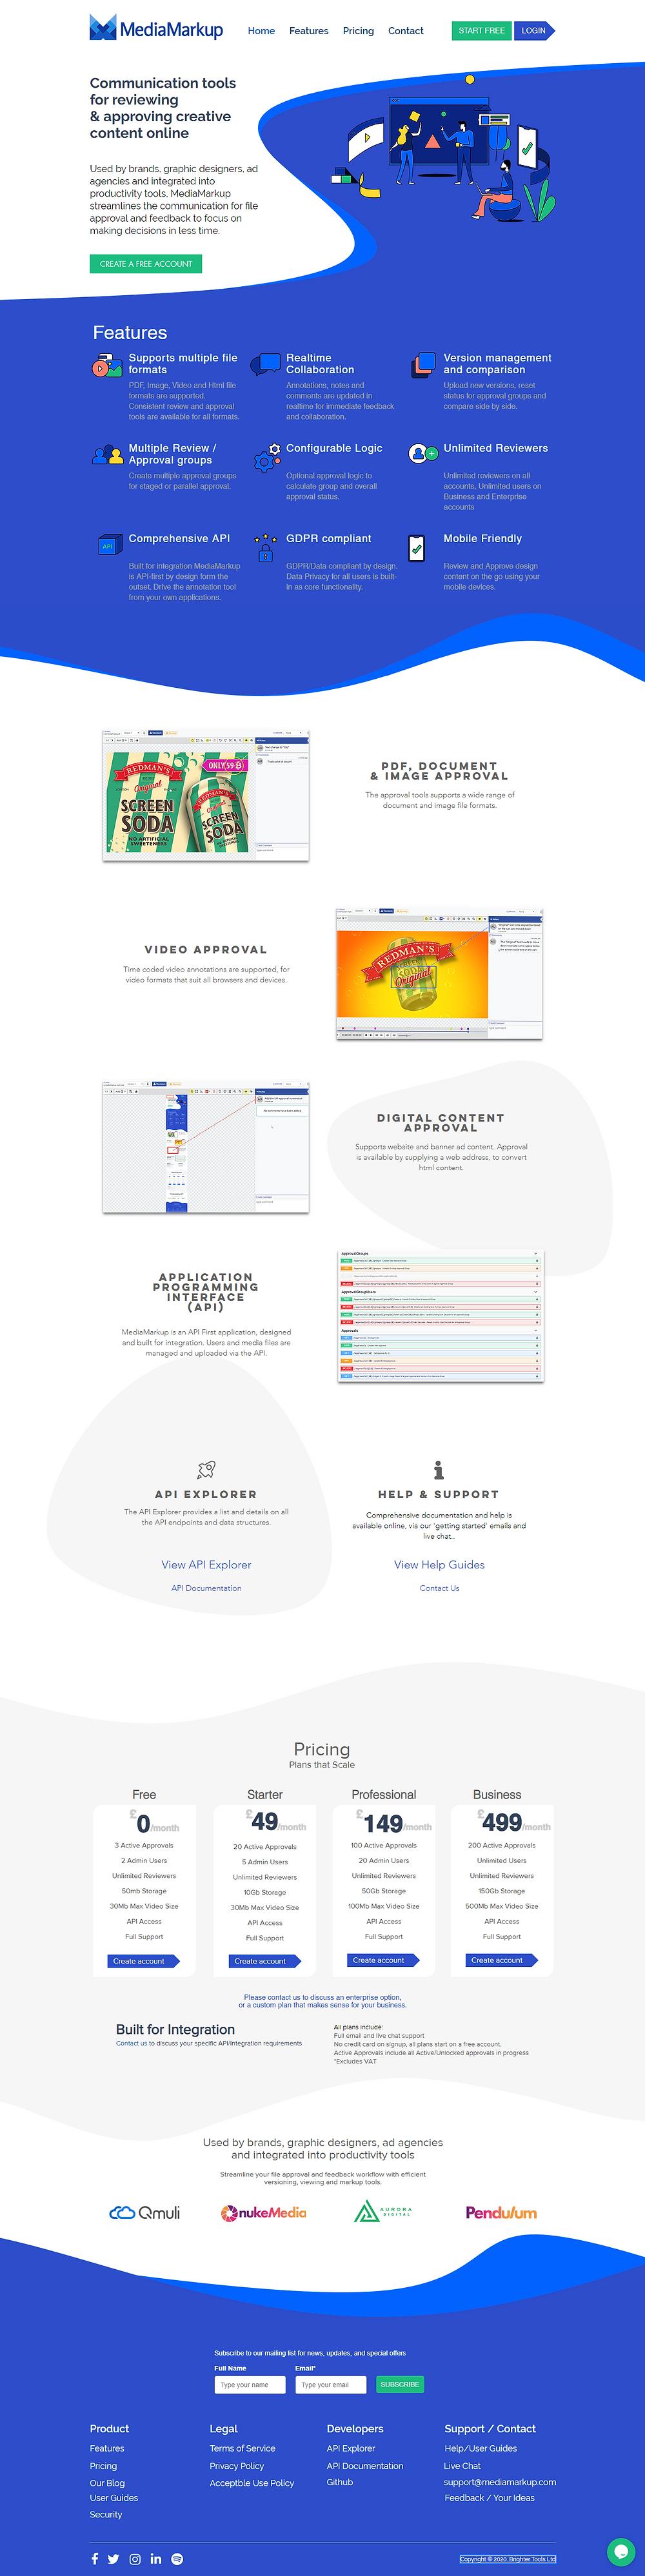 Screenshot of the MediaMarkup website